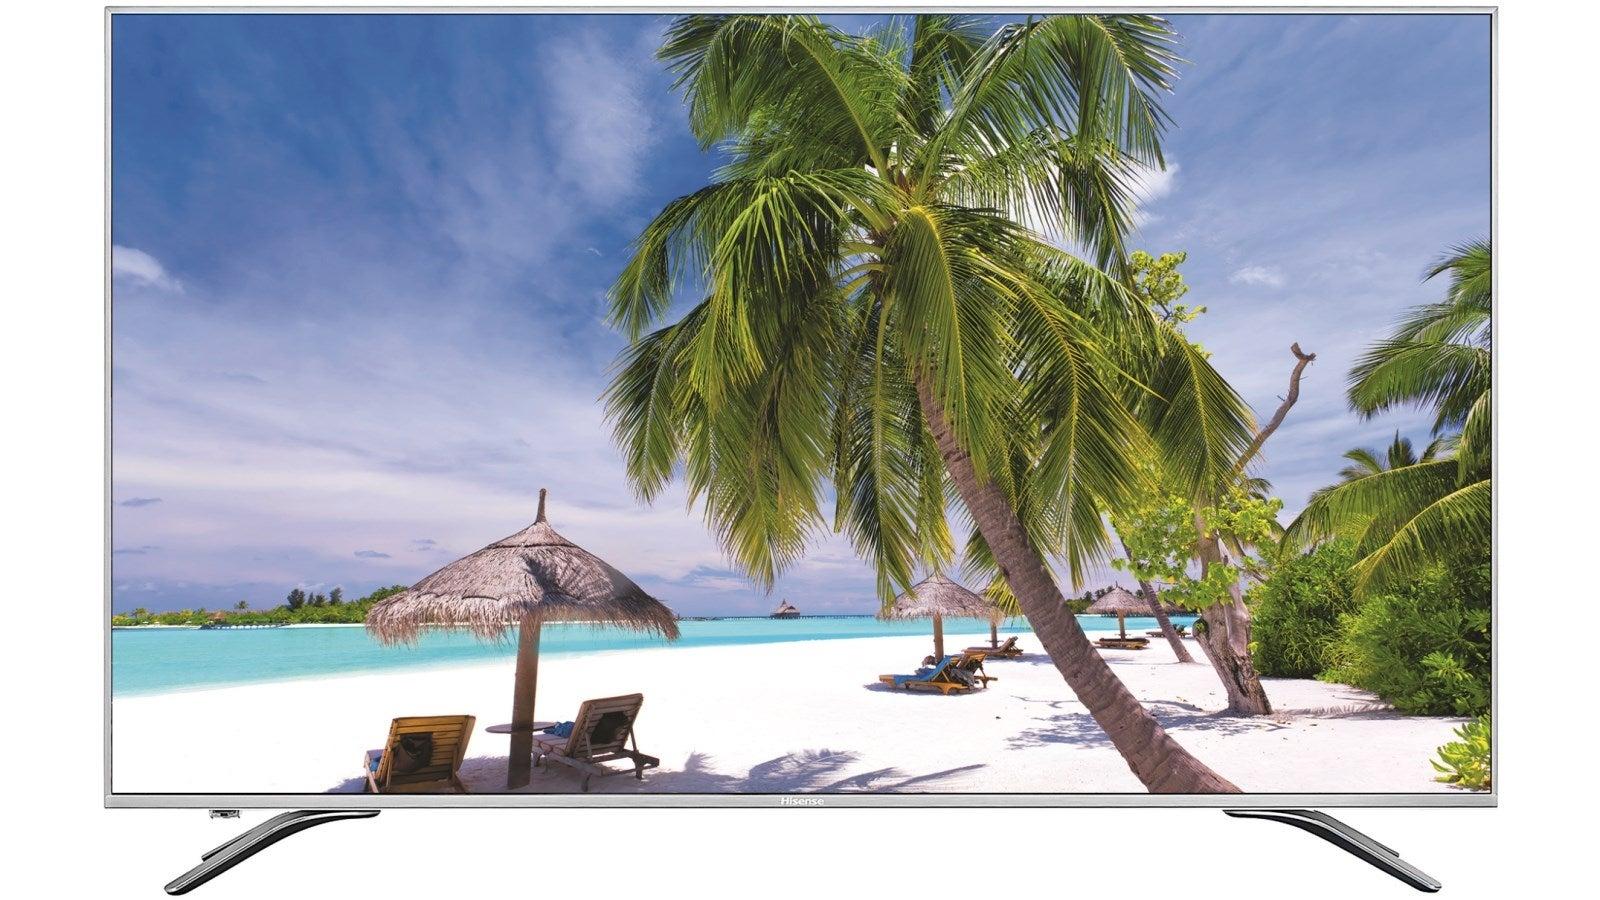 Hisense 50P6 50inch UHD LED LCD TV